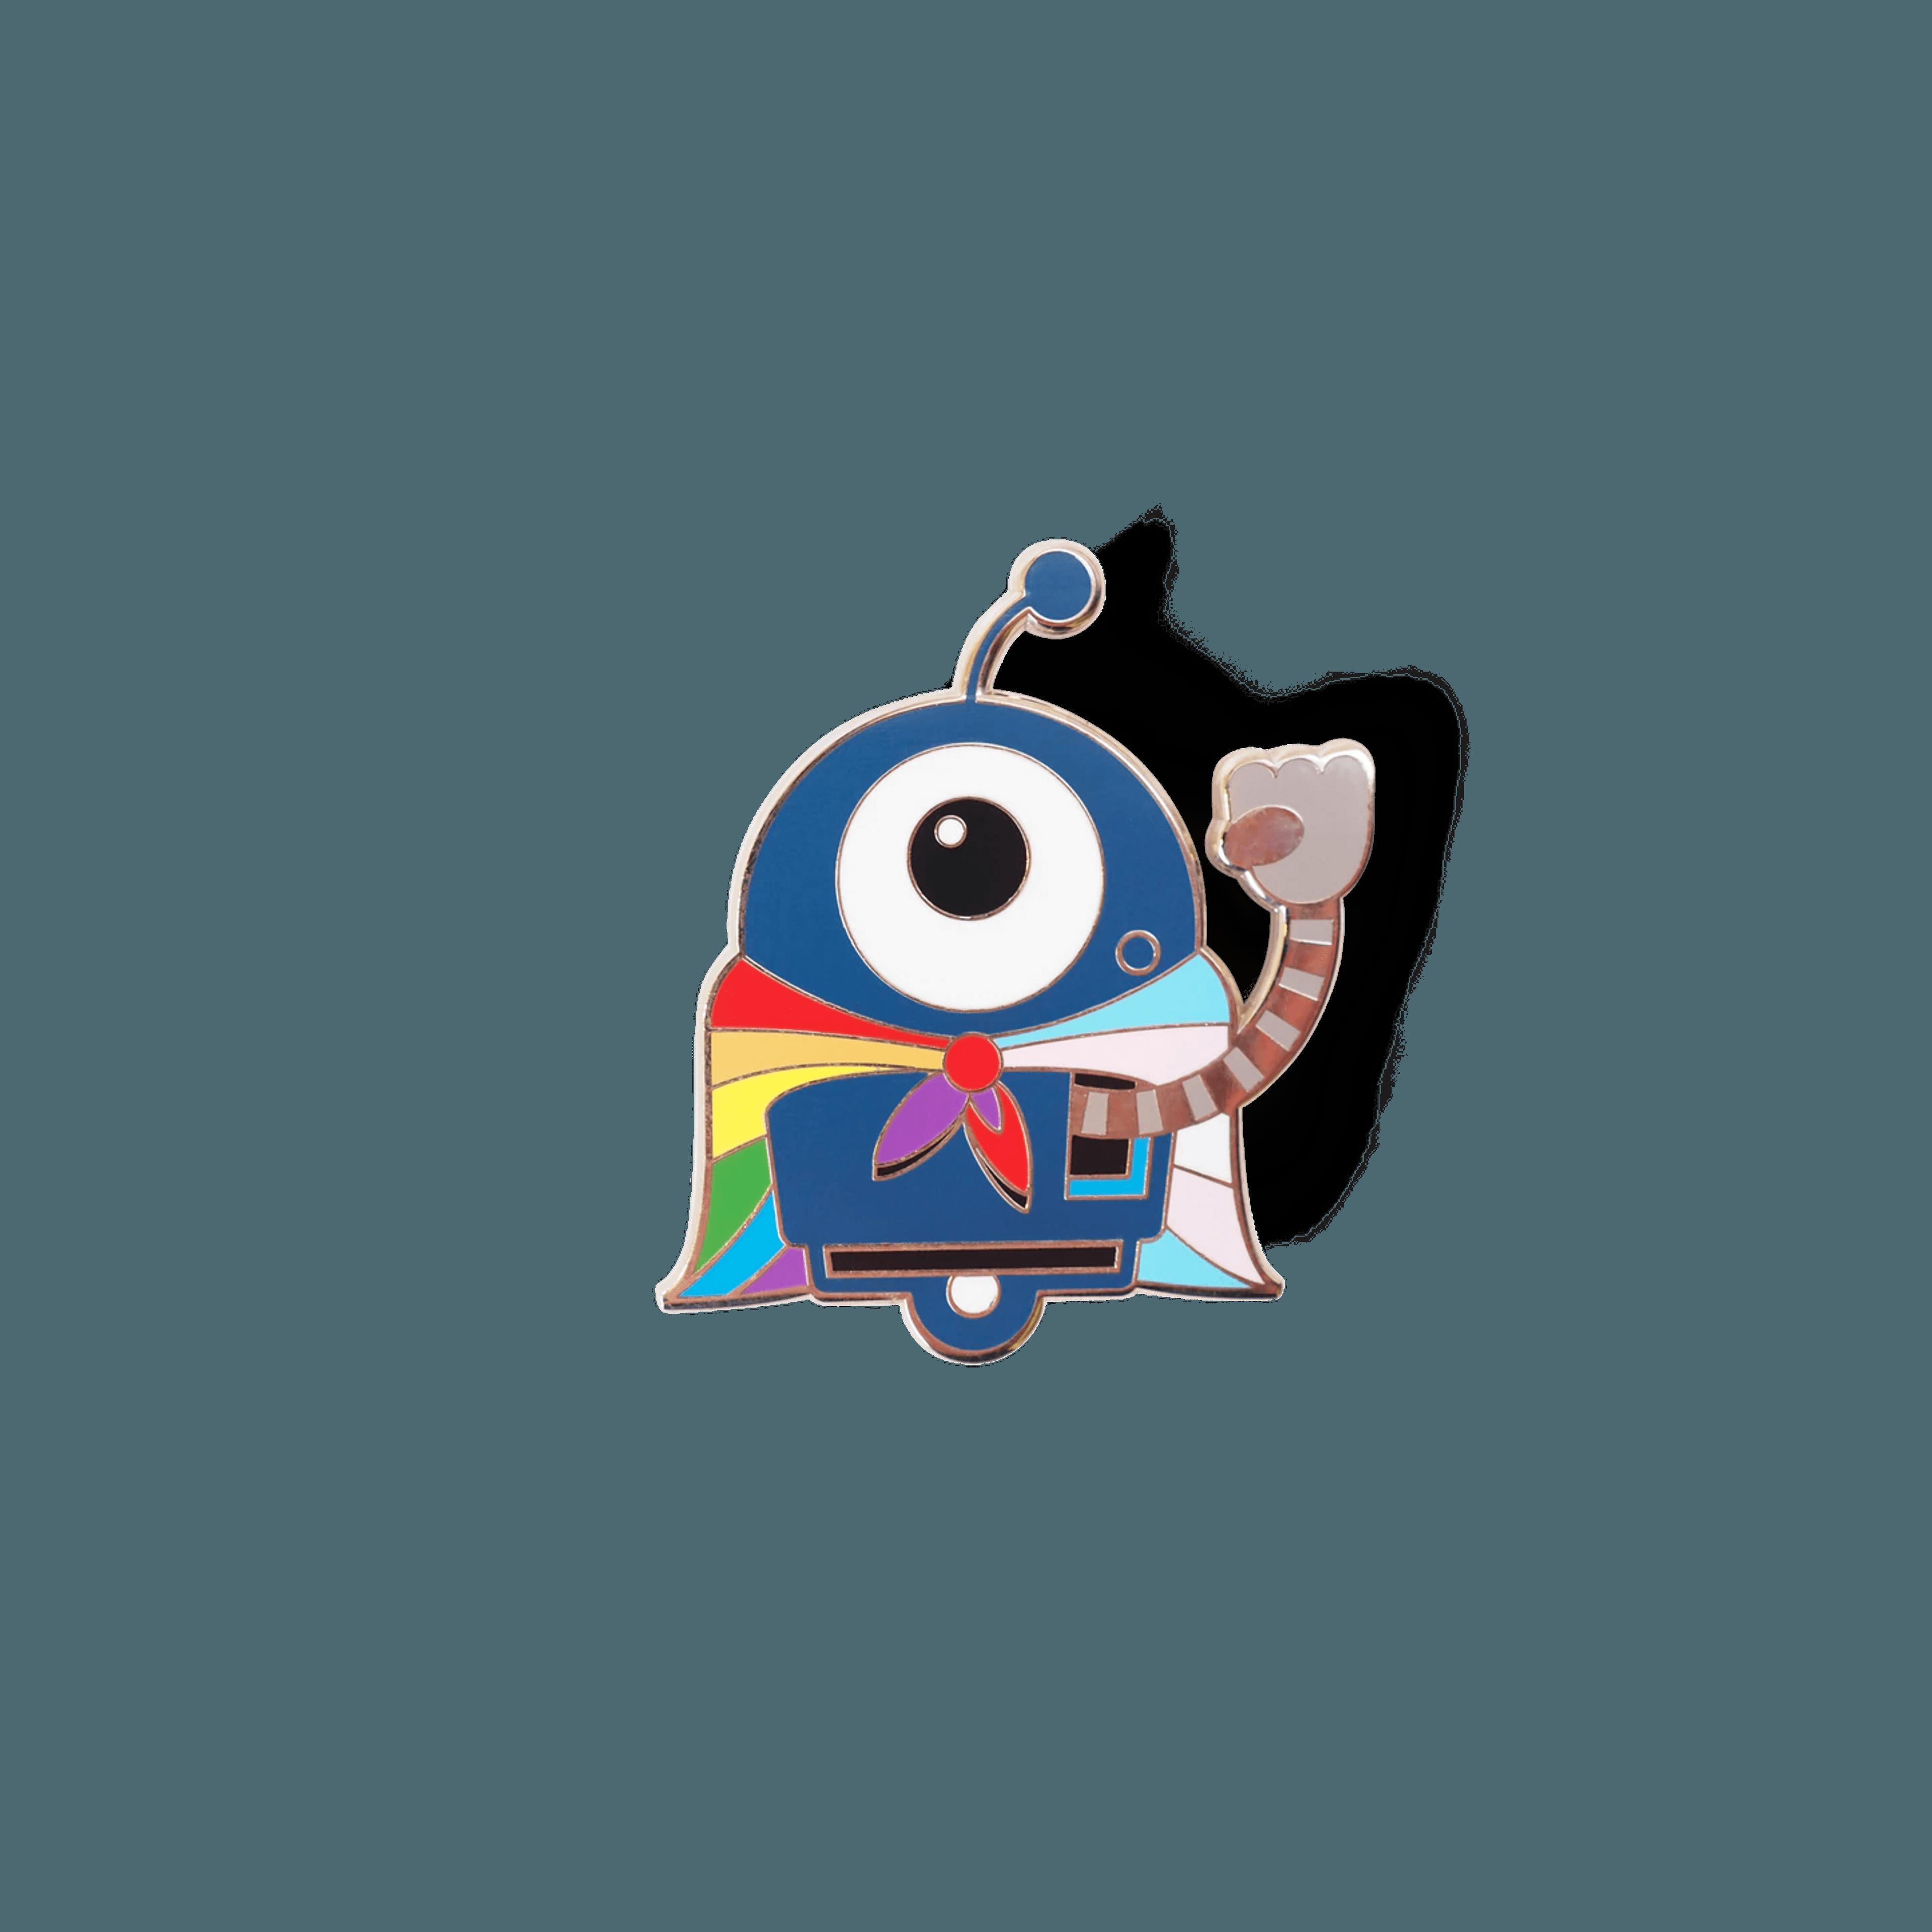 Pride Bot 1.75 inch enamel pin